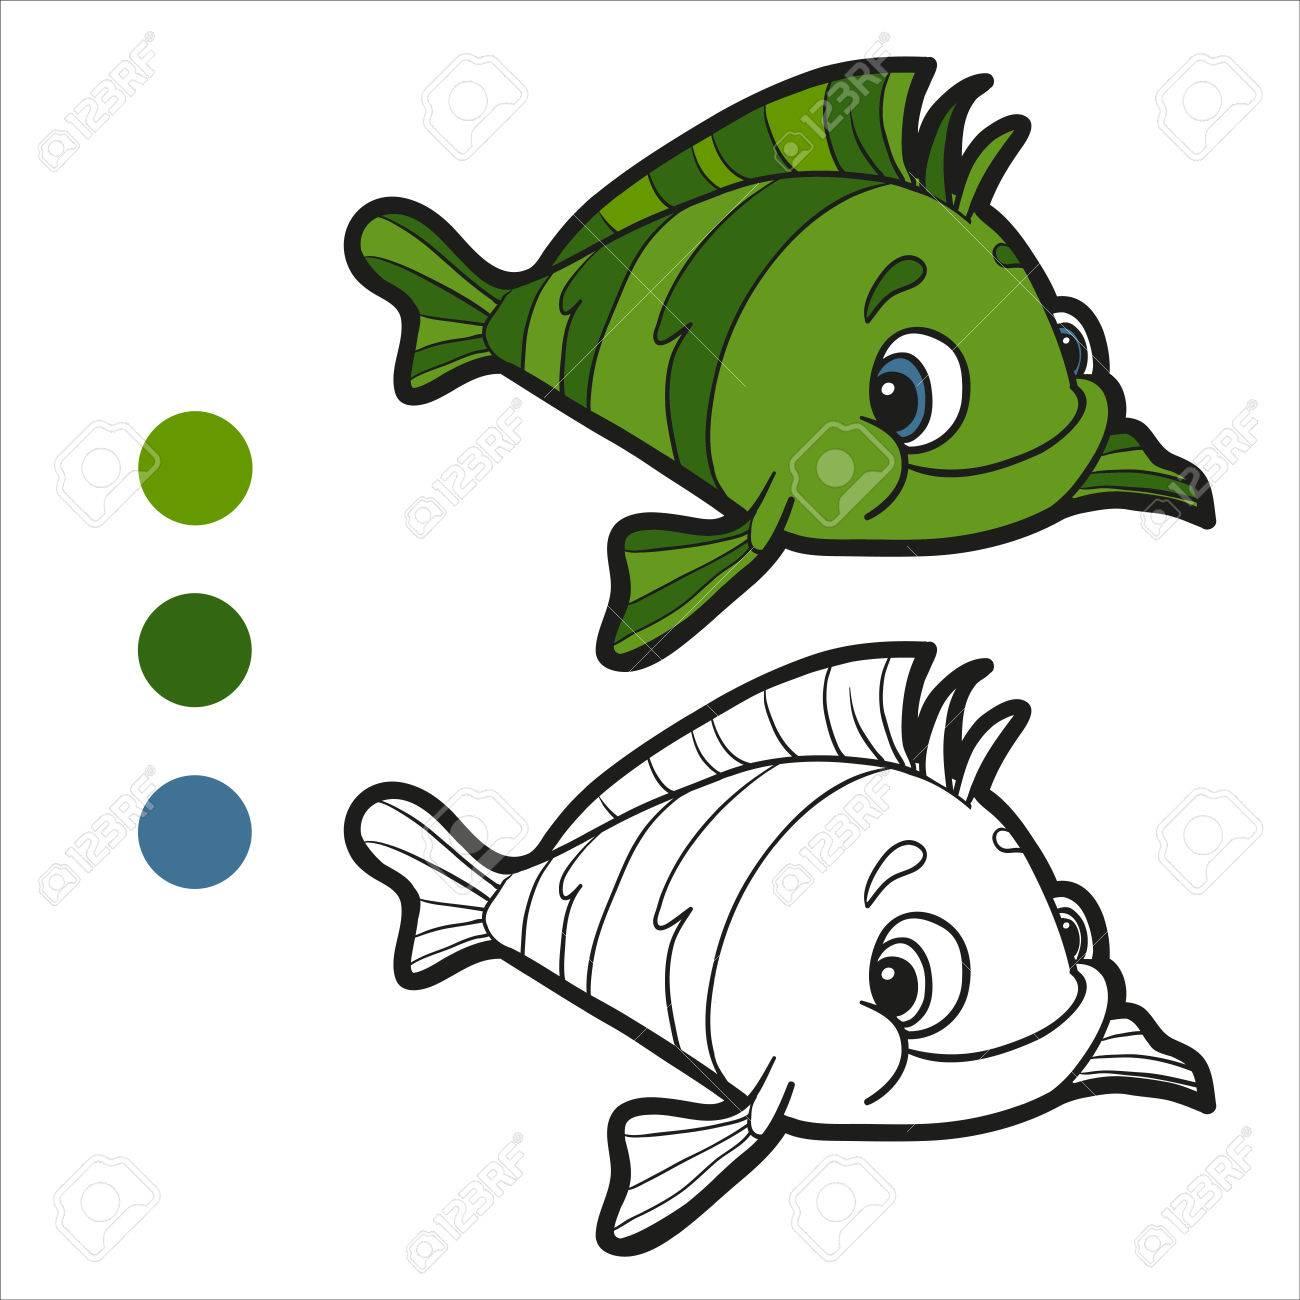 Coloring Book (fish) Royalty Free Cliparts, Vectors, And Stock ...